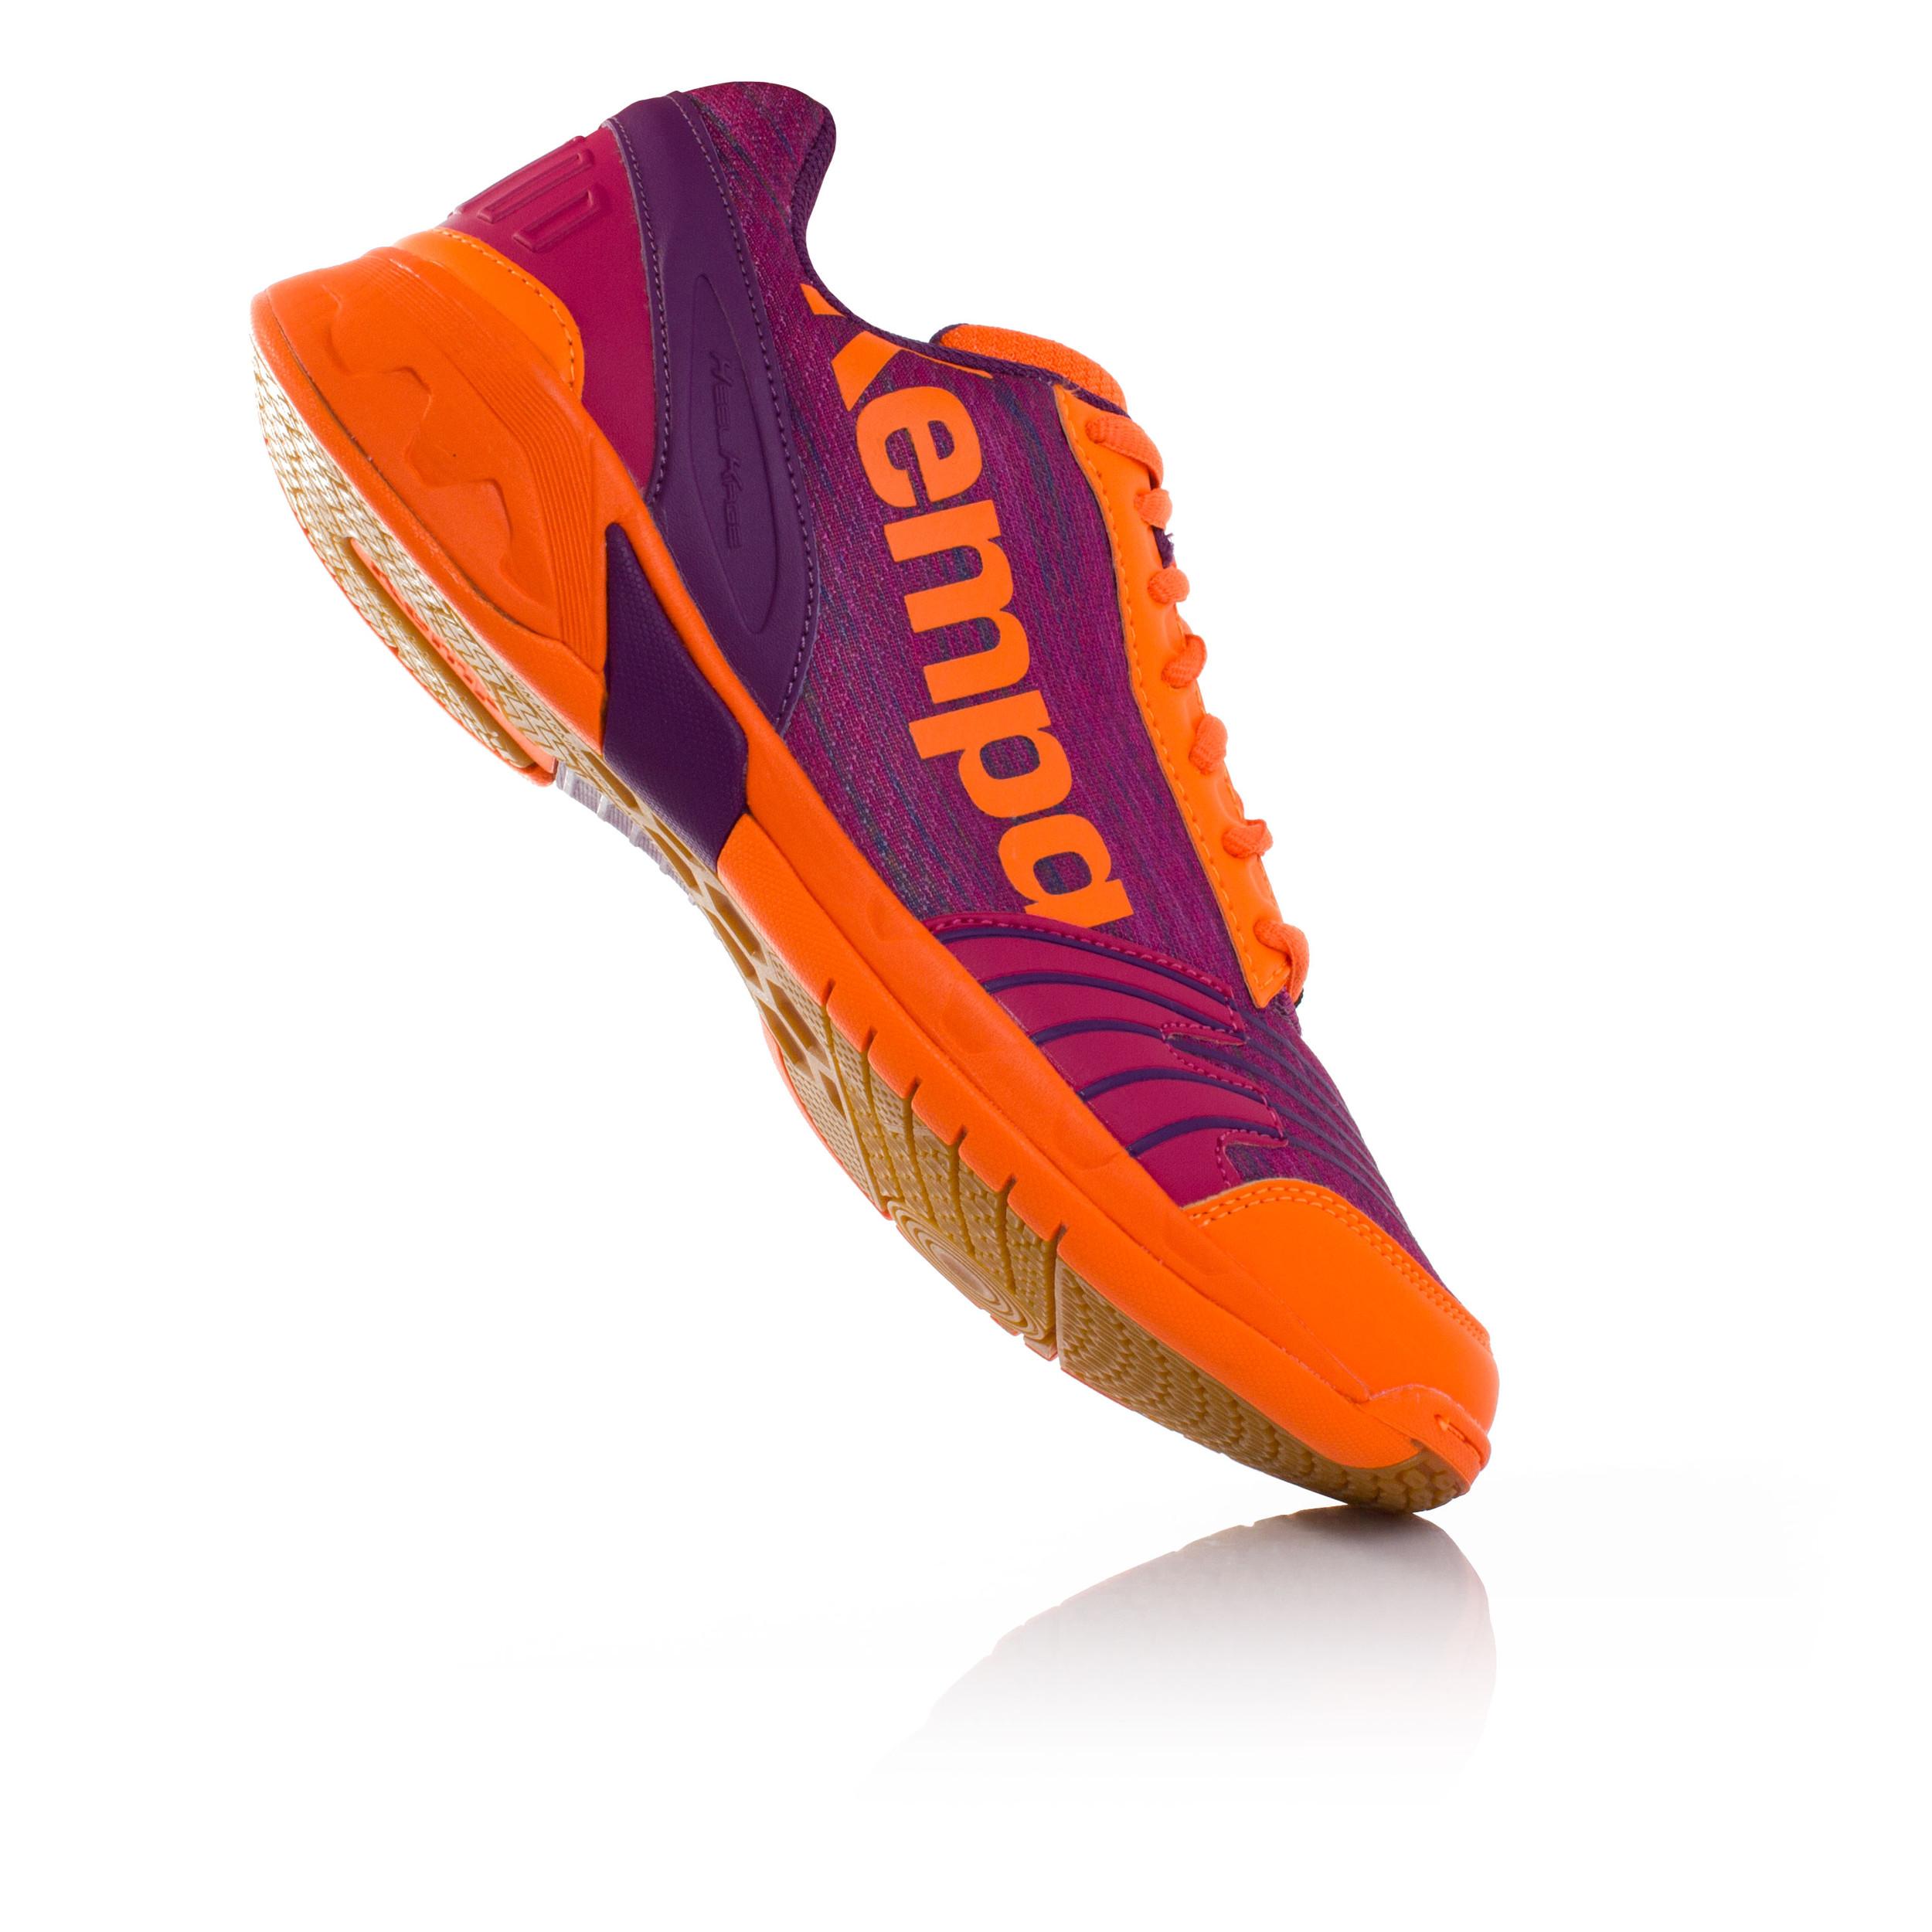 Kempa Attack Femmes Handball Chaussures De Sport Baskets Multicolore ... 267579821d9